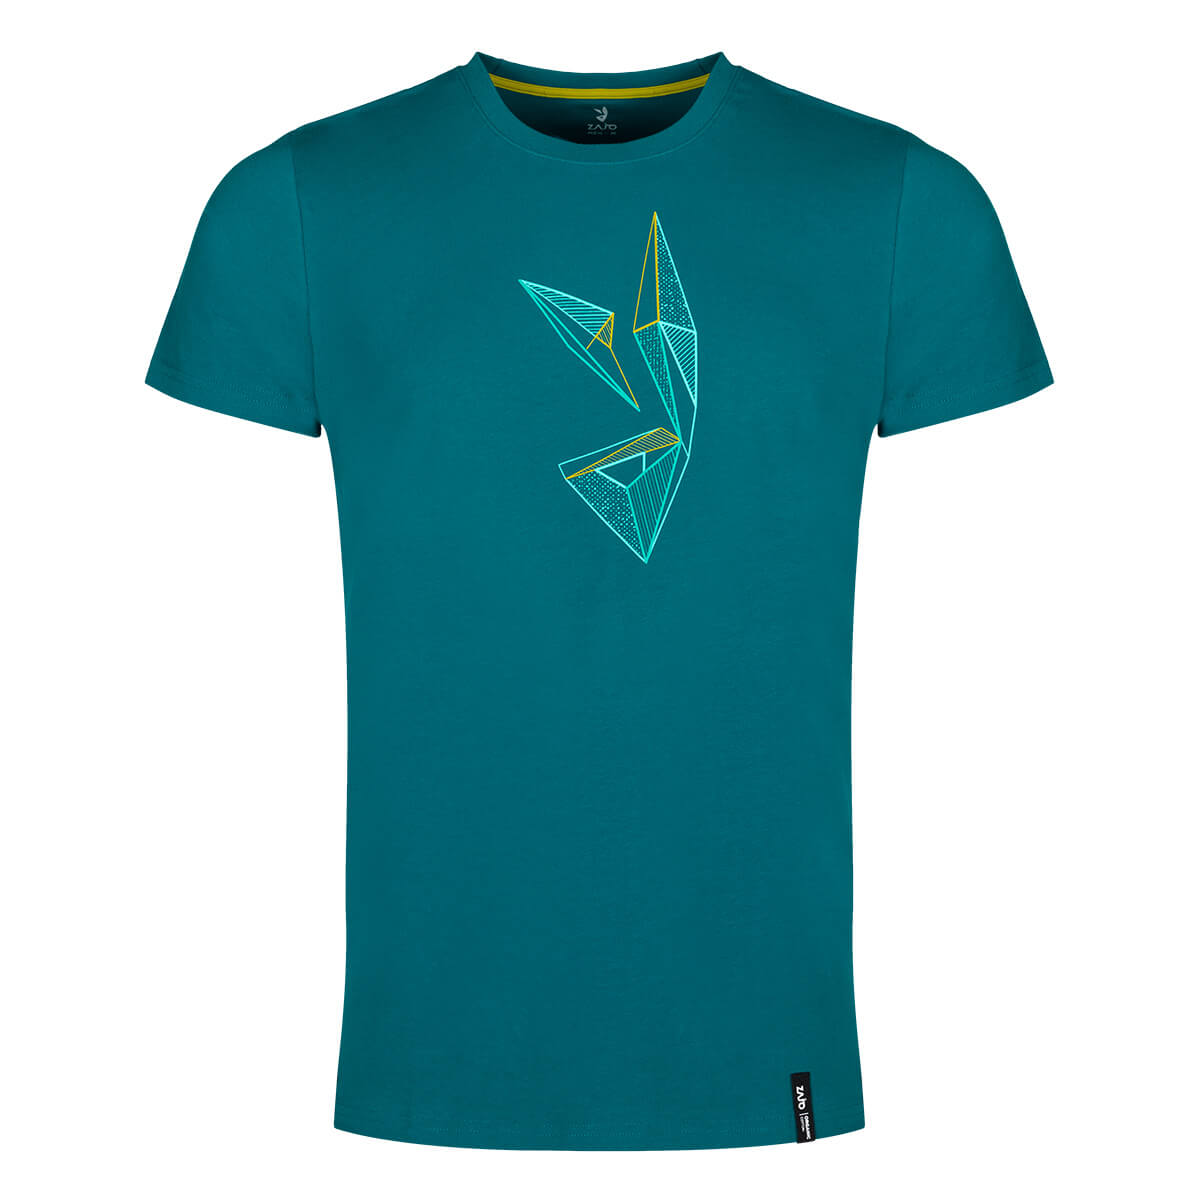 ZAJO Bormio T-Shirt SS pánske tričko Deep Lagoon Rabbit - veľkosť M